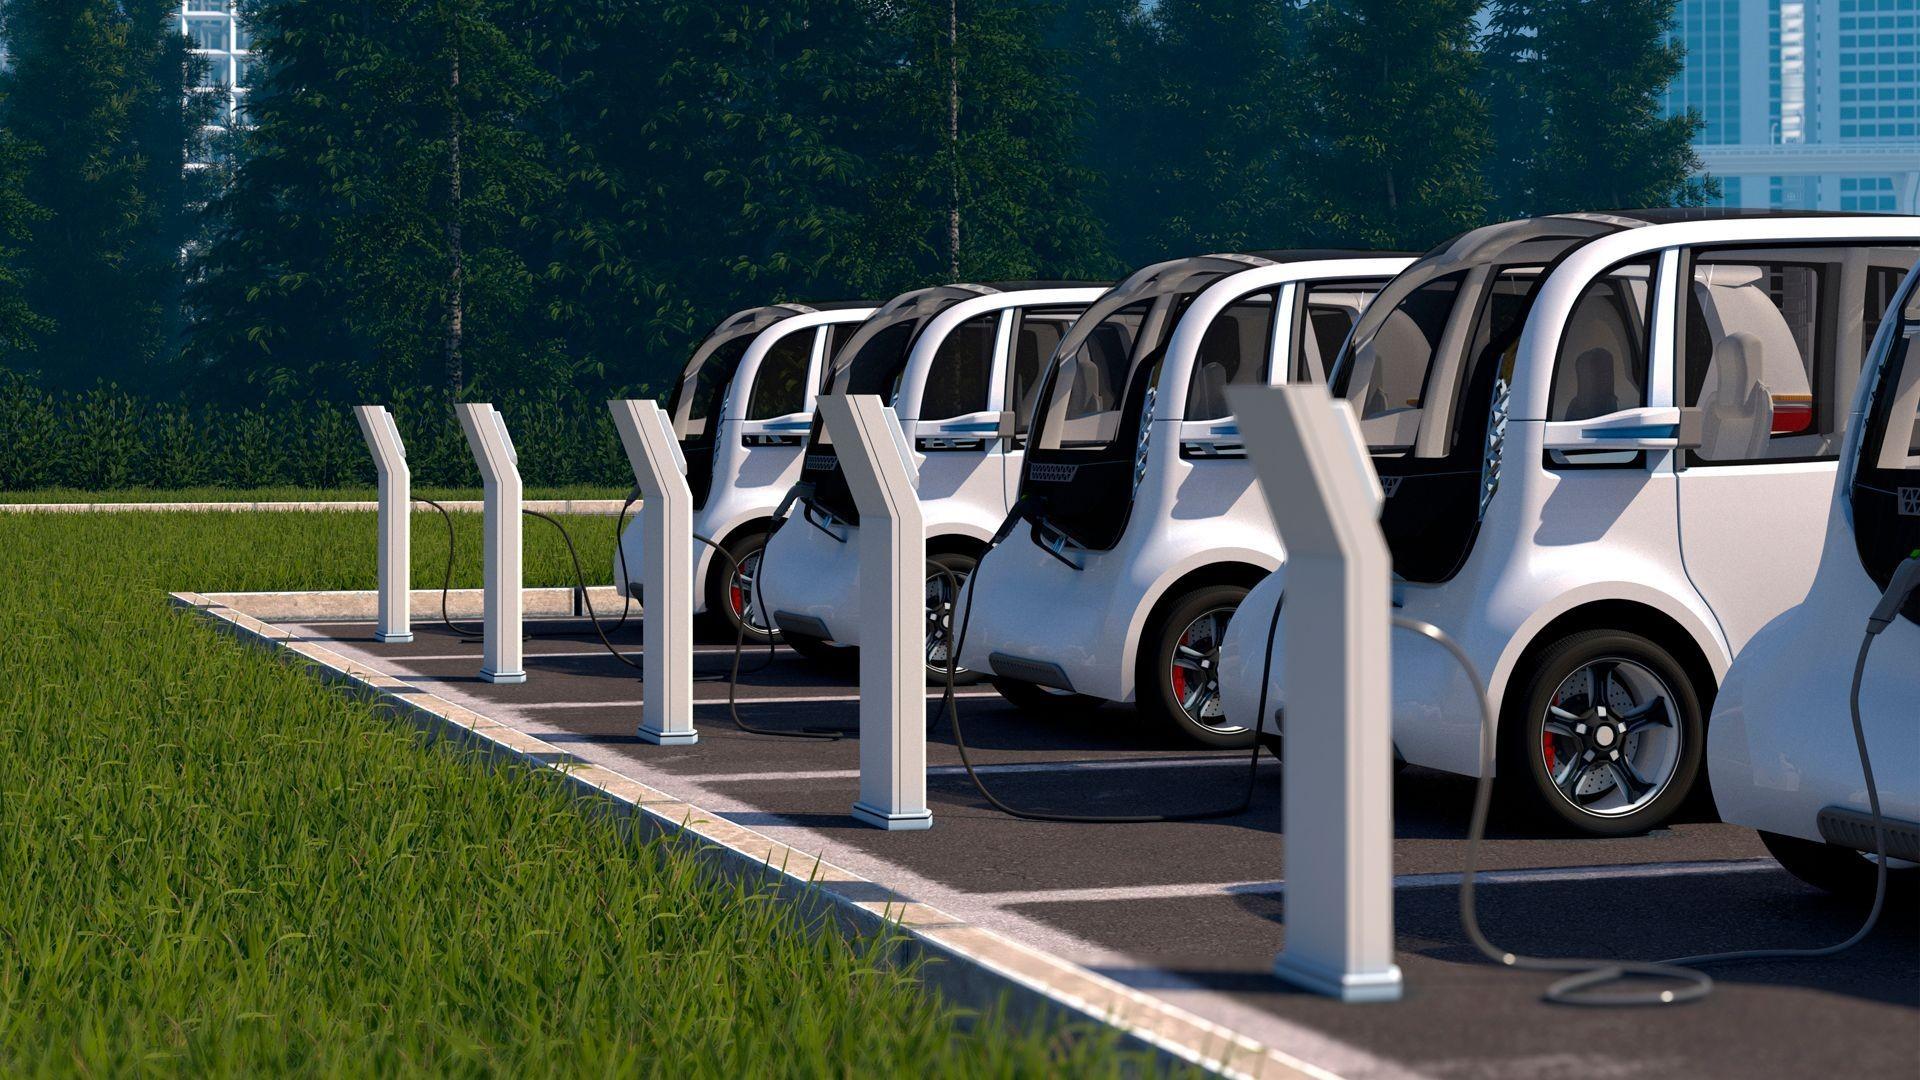 Puntos de recarga para vehículos eléctricos en Sevilla